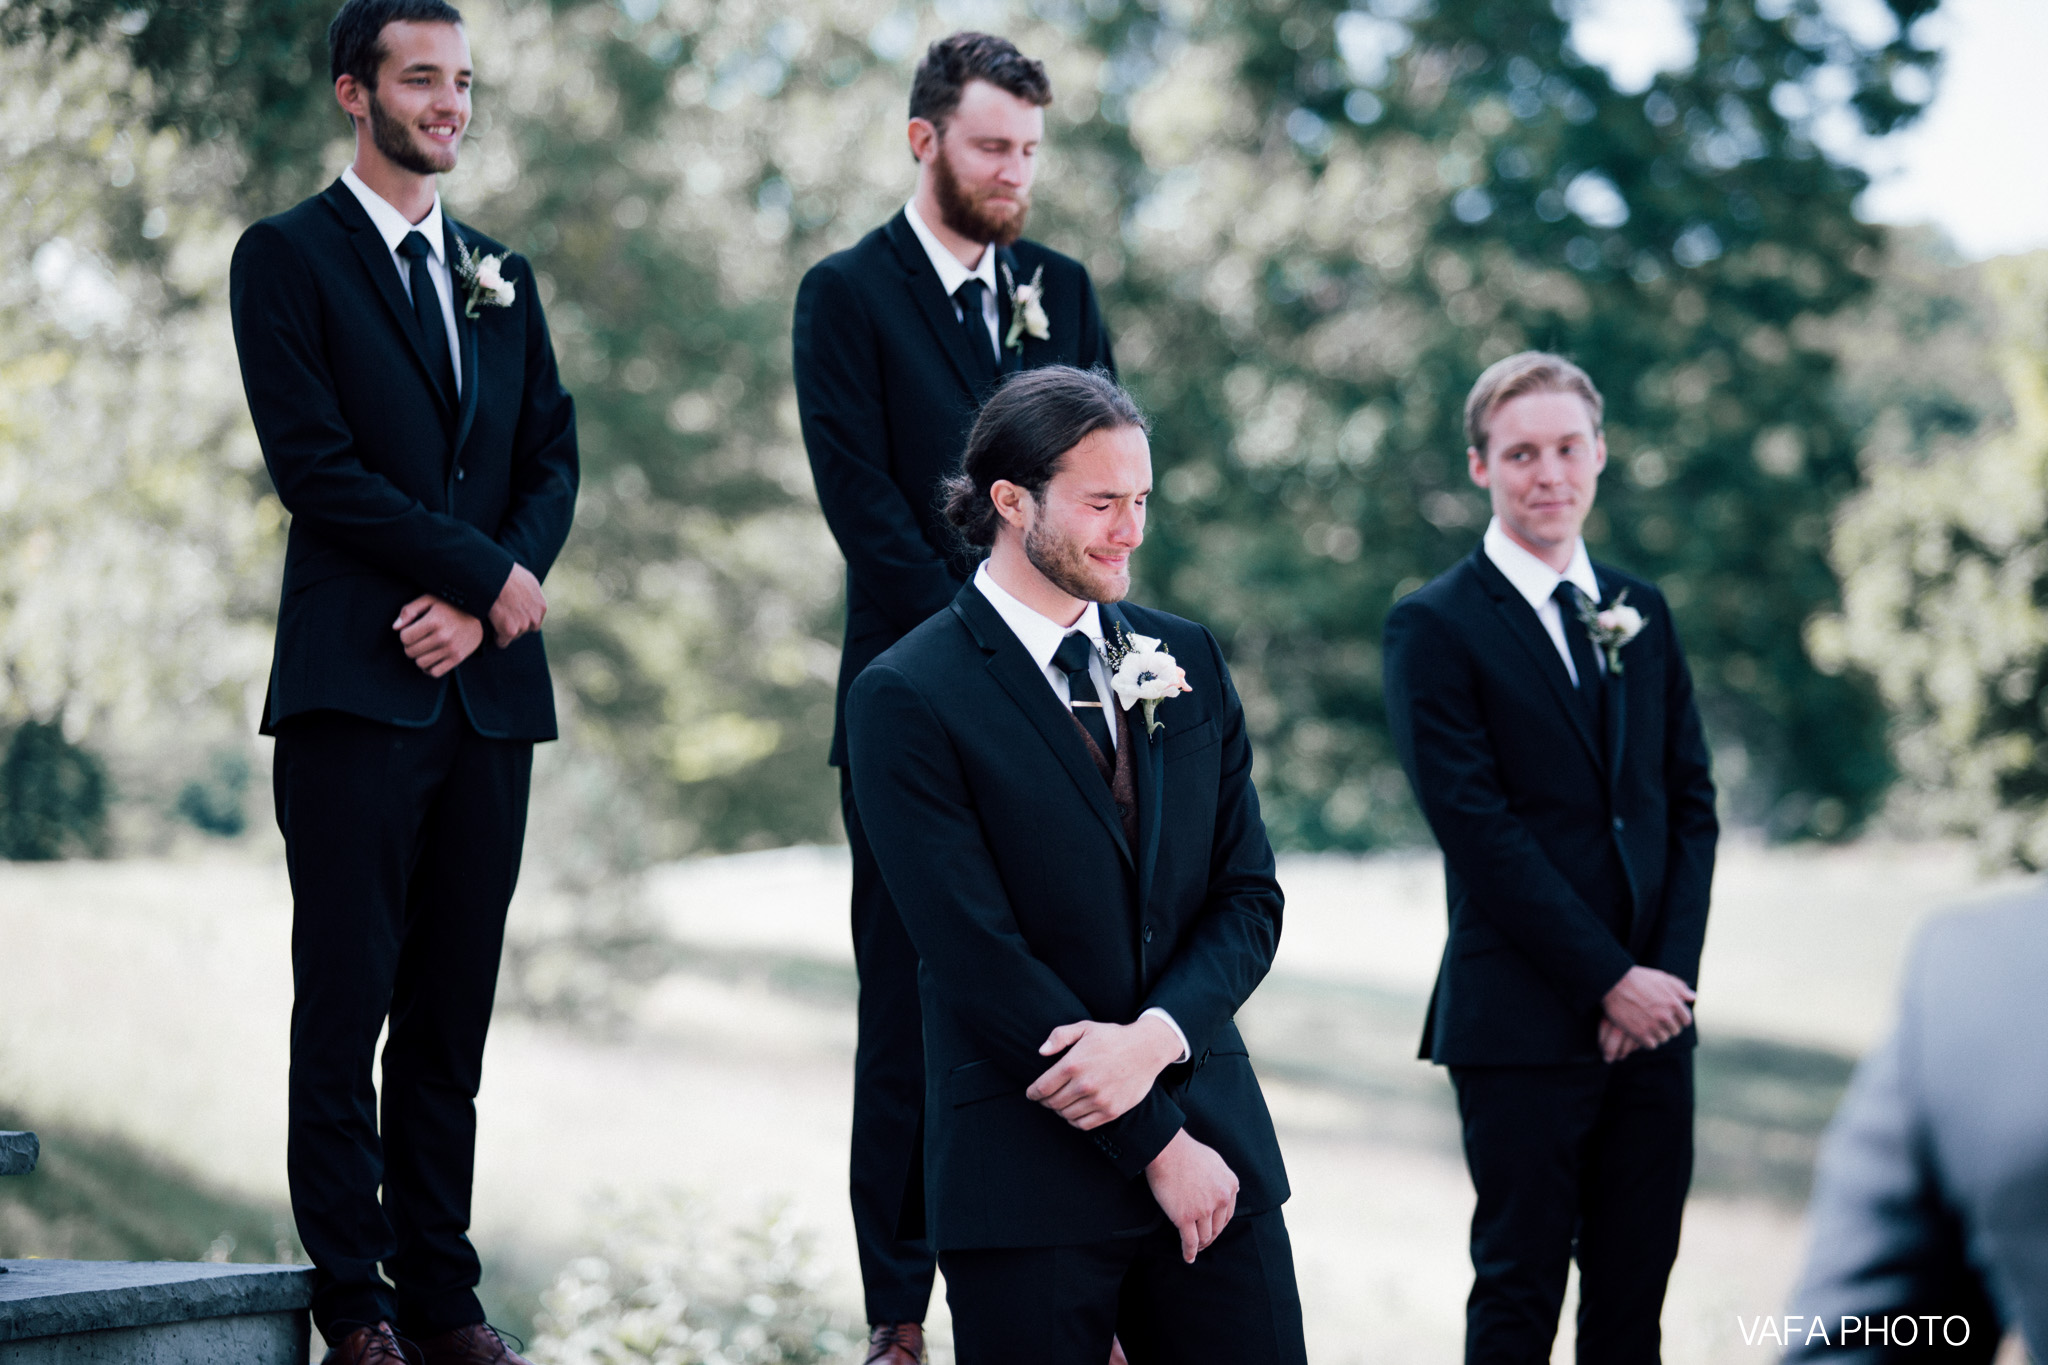 The-Felt-Estate-Wedding-Kailie-David-Vafa-Photo-313.jpg